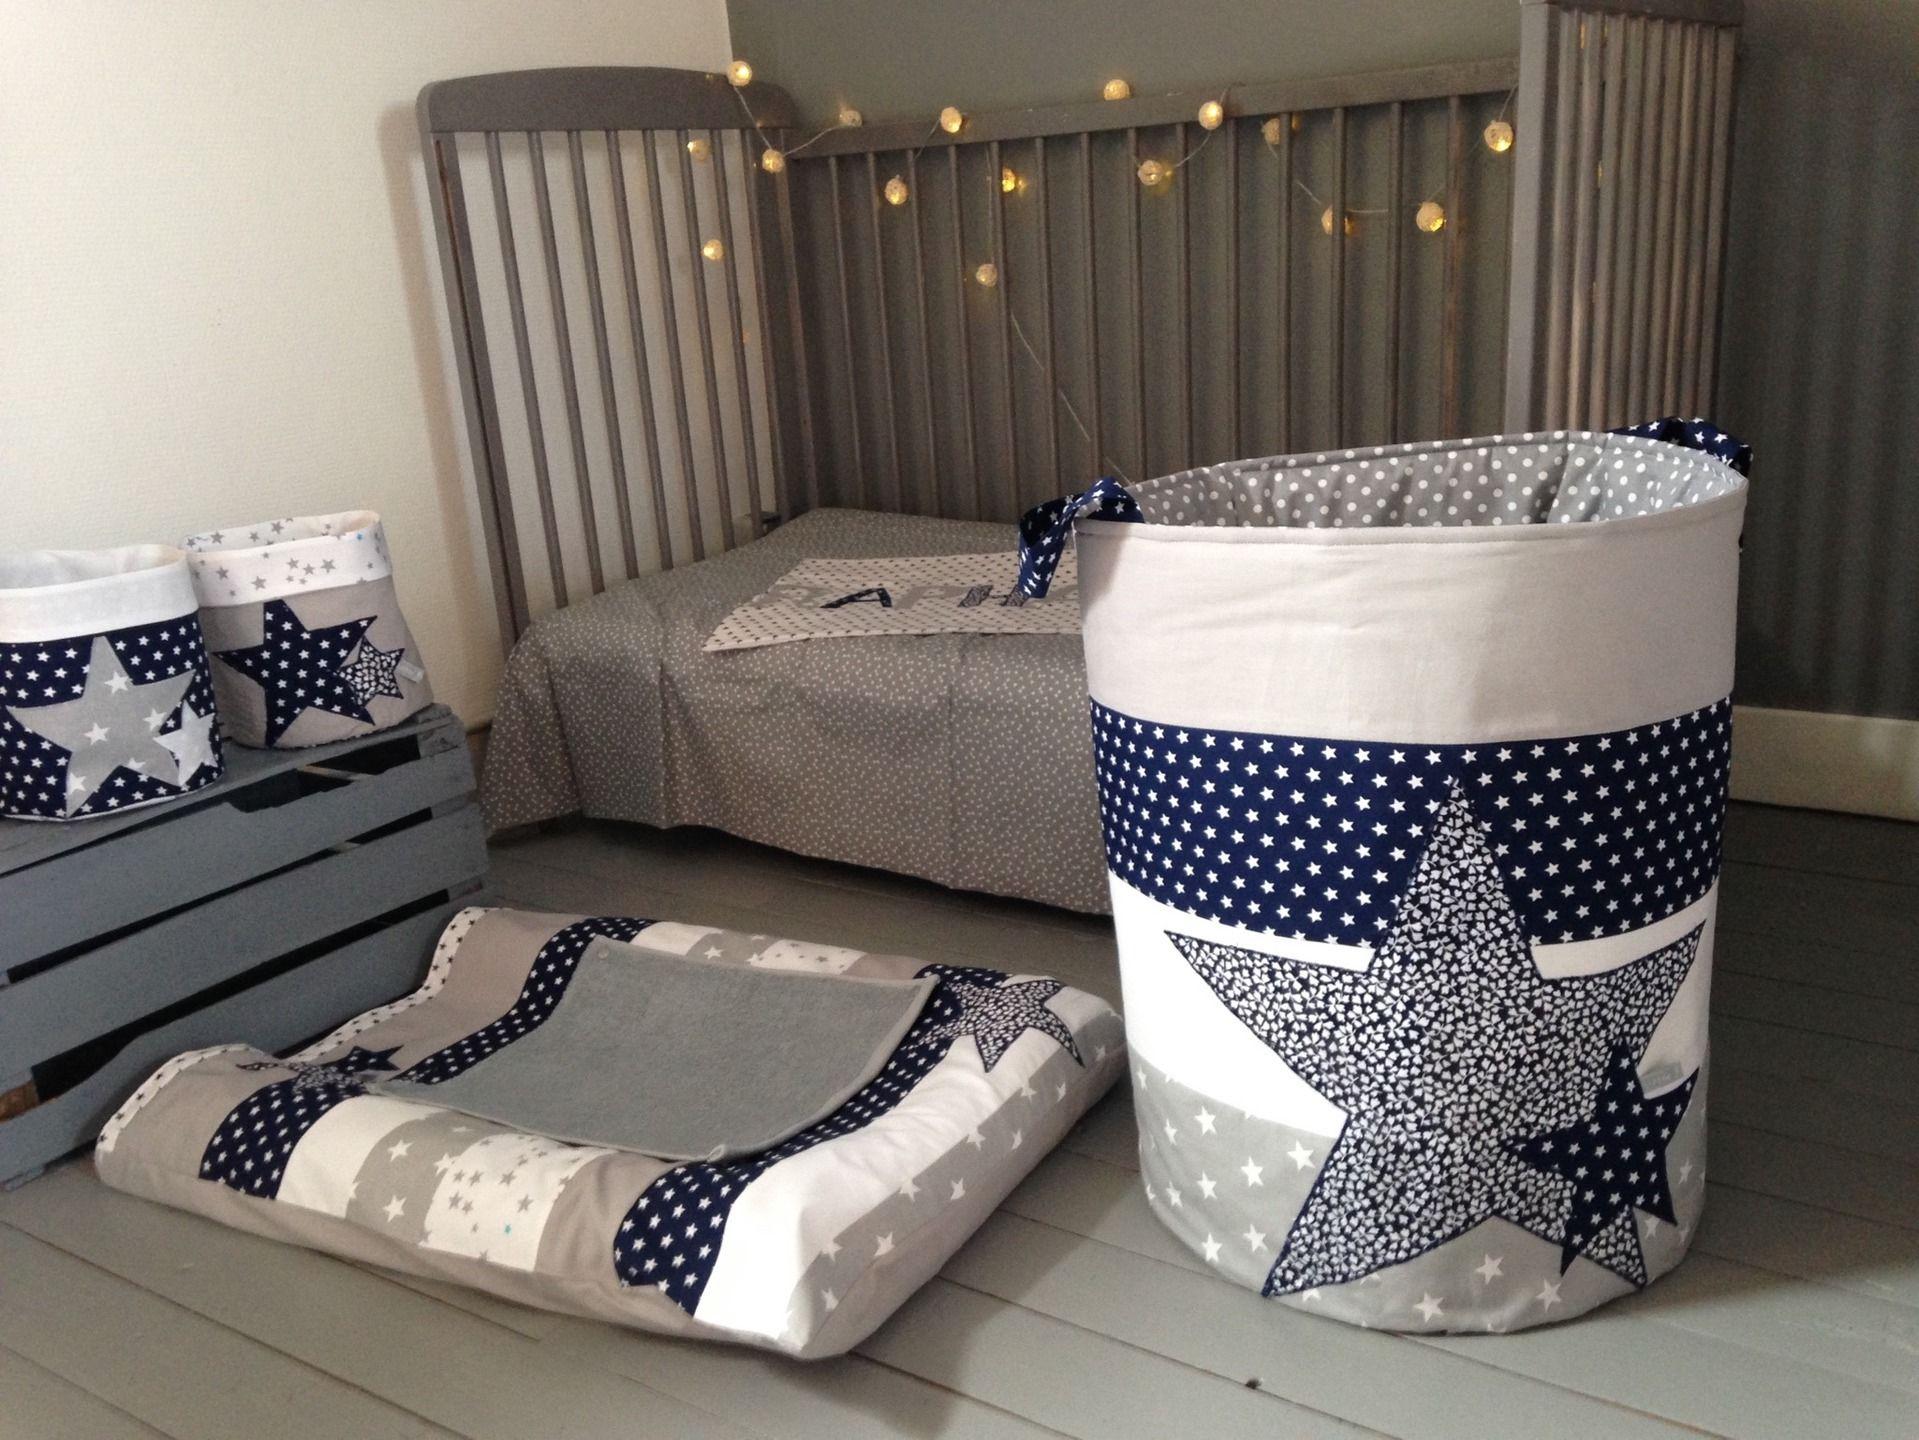 Sac A Jouets Linge Etoiles Bleu Marine Gris Blanc Chambre D